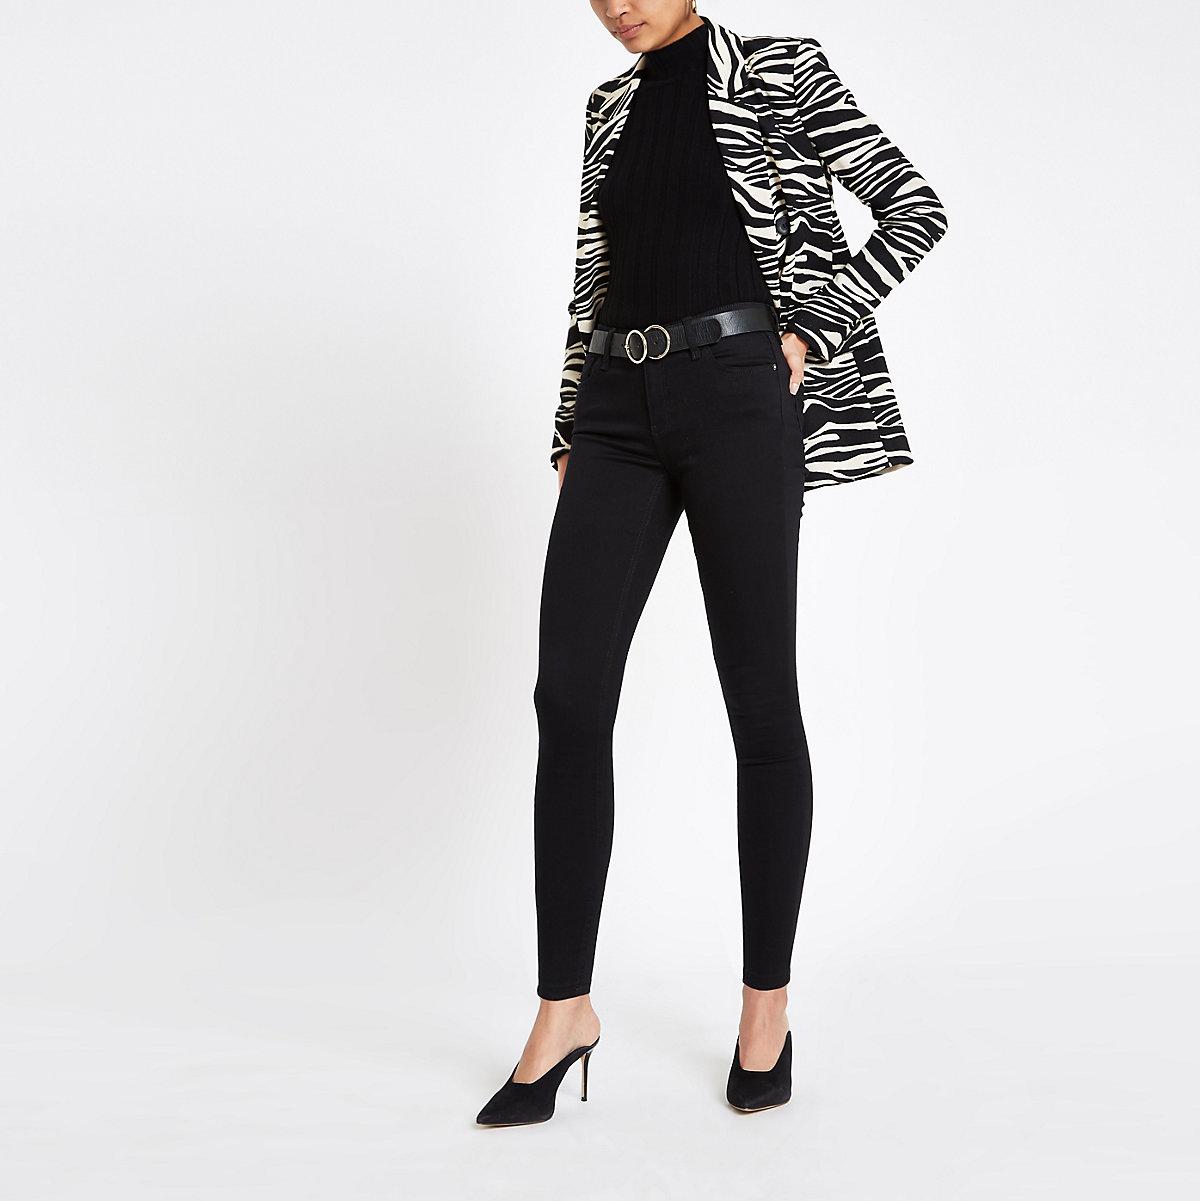 Amelie - Zwarte superskinny jeans met halfhoge taille